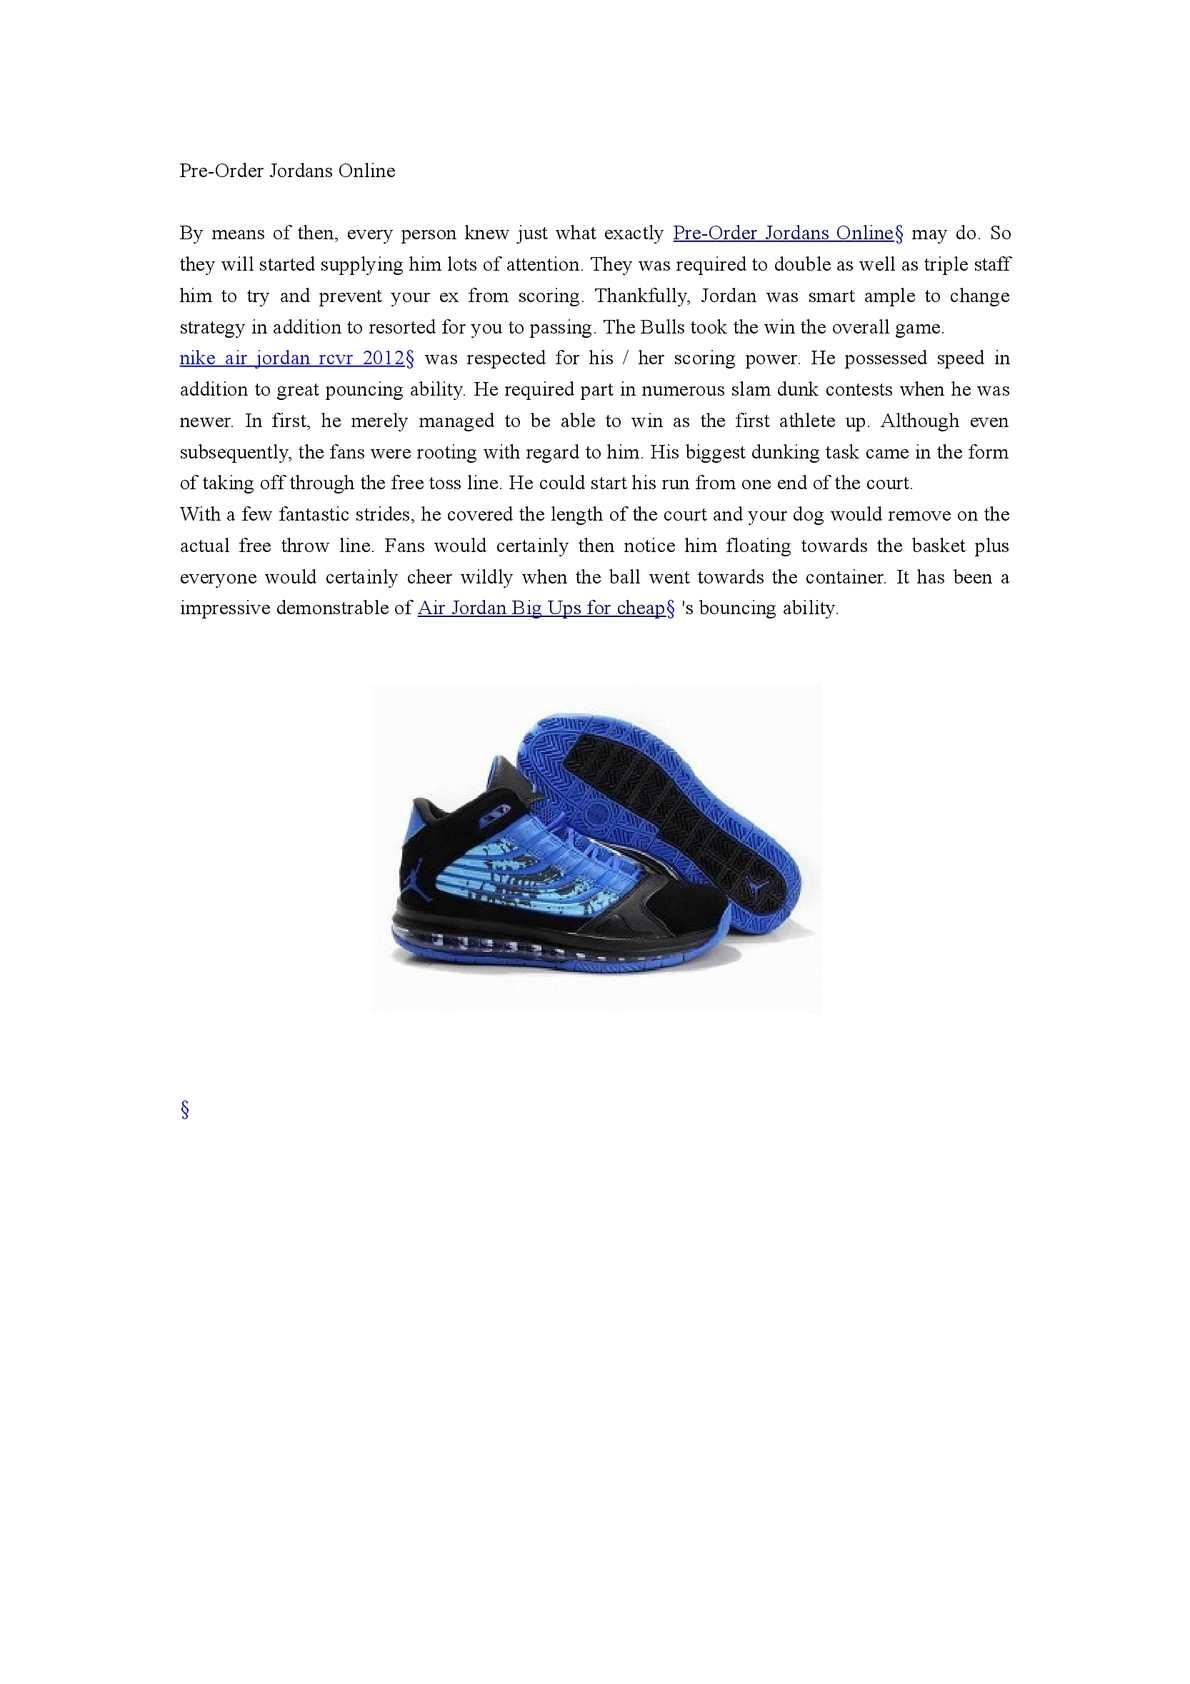 Calaméo - Pre-Order Jordans Online